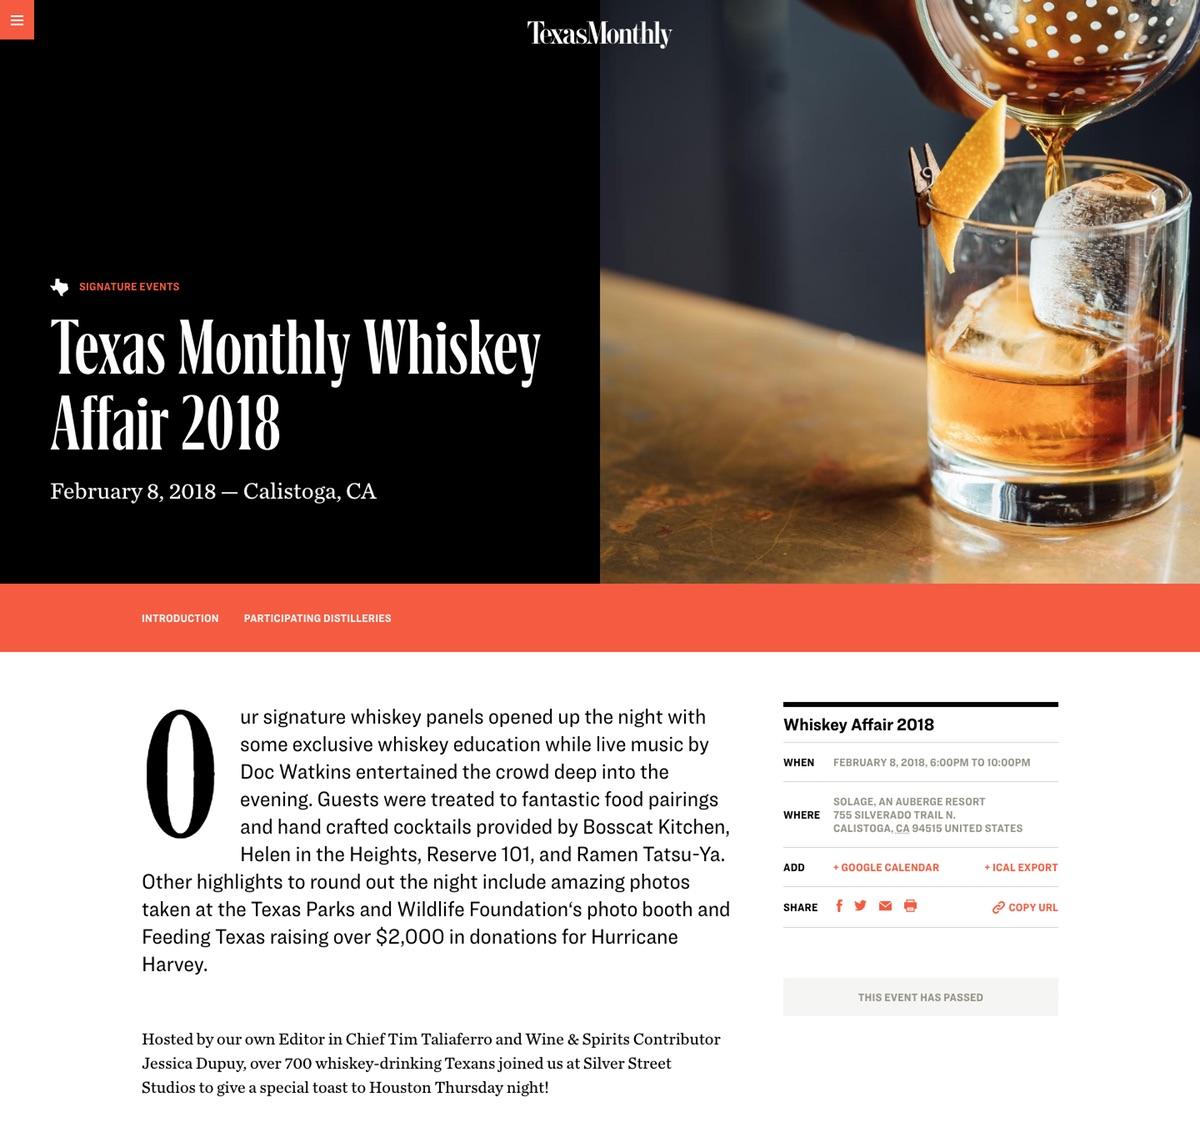 Texas Monthly Whiskey Affair 2018